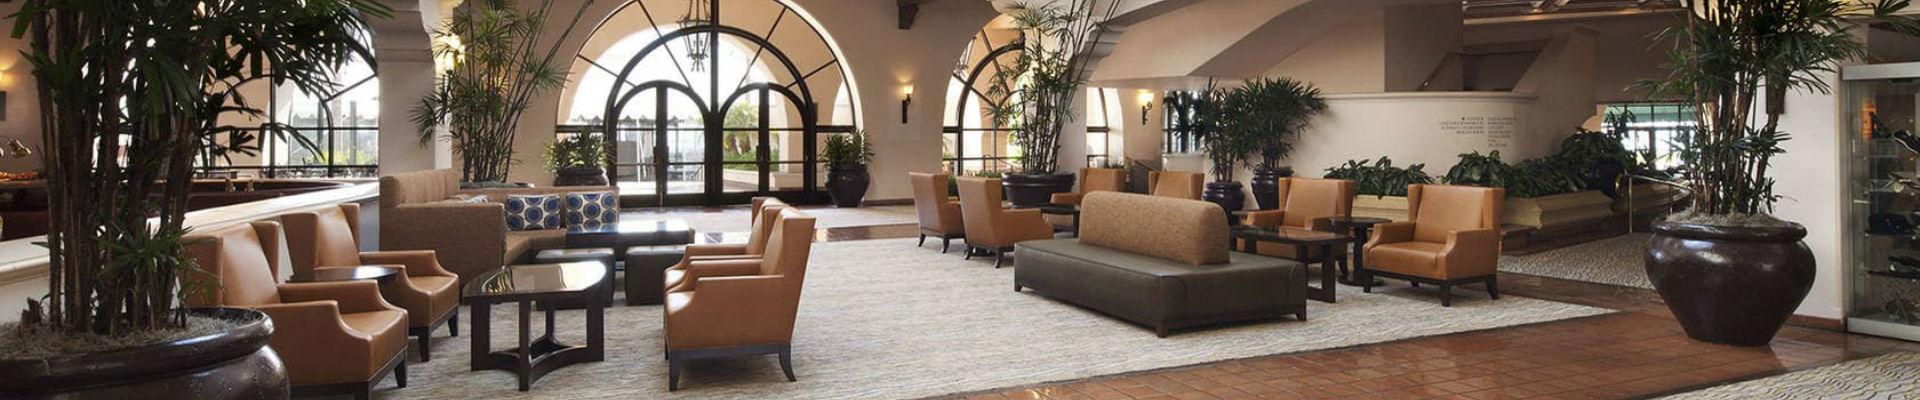 The Fess Parker DoubleTree by Hilton Resort